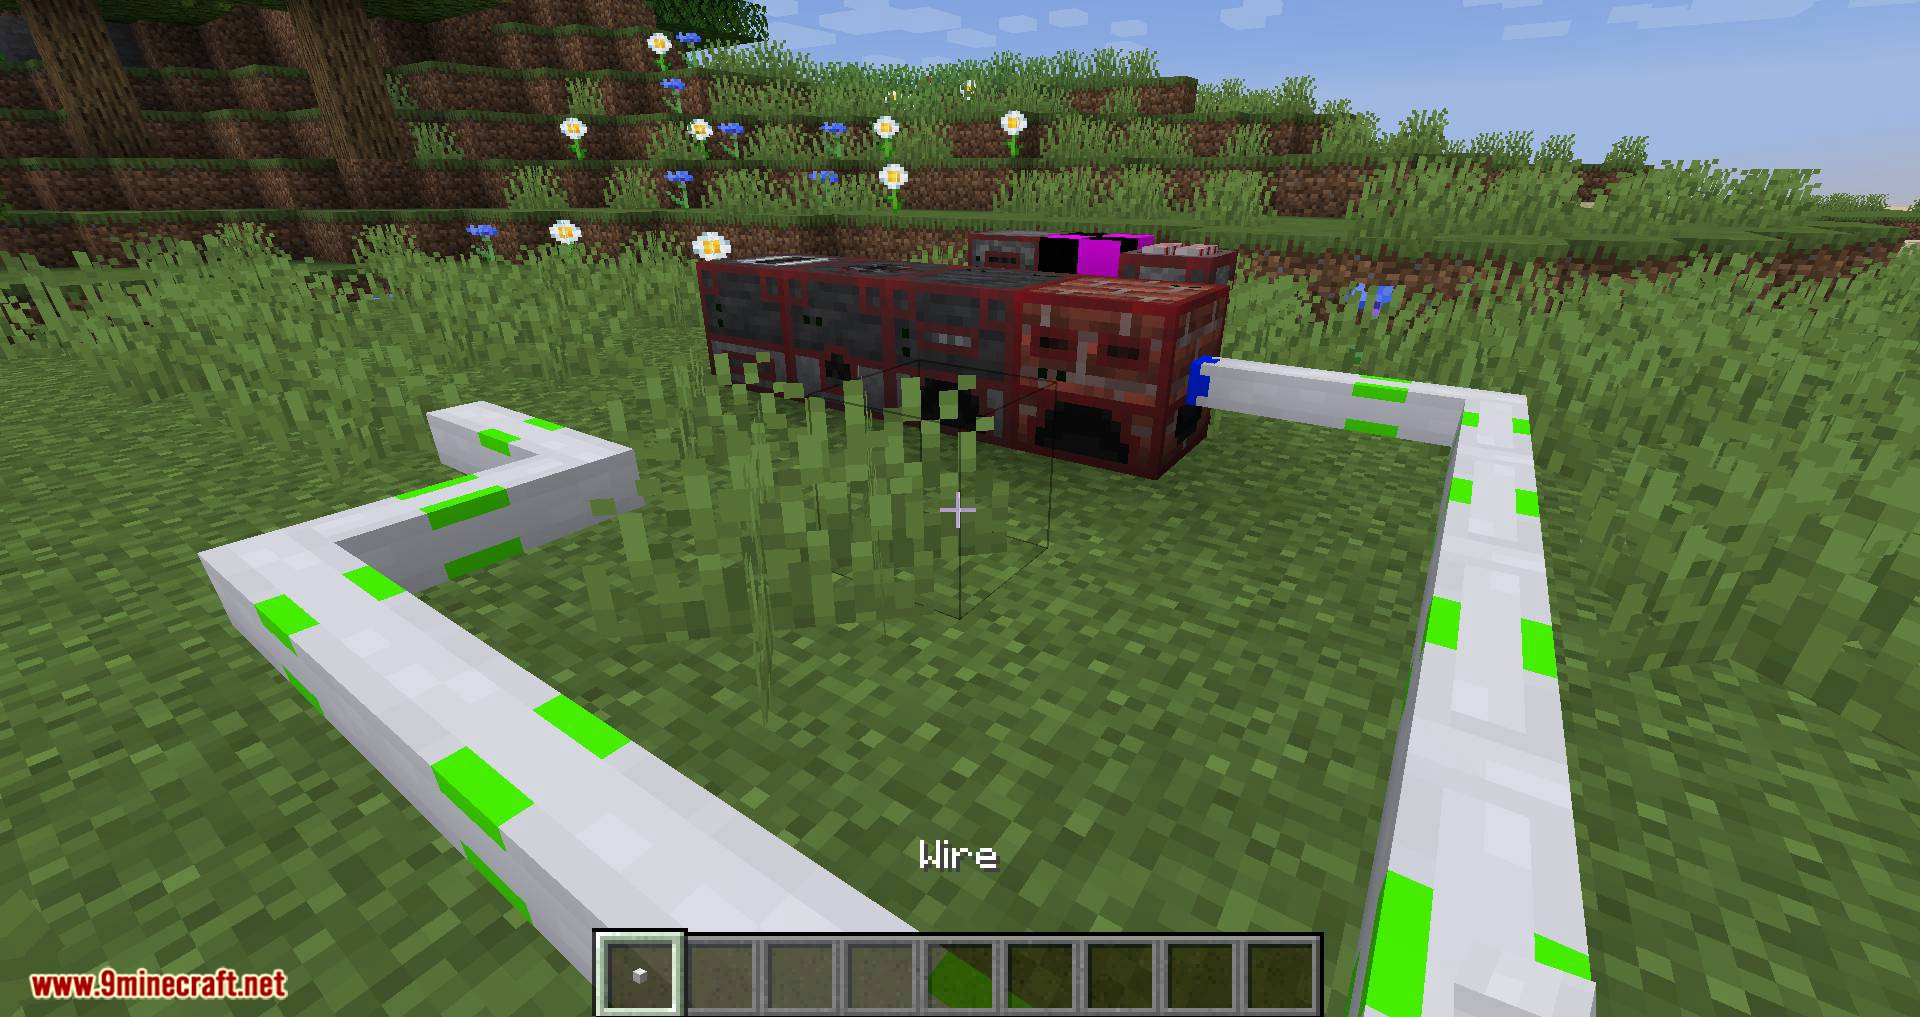 Silent_s Mechanism mod for minecraft 07